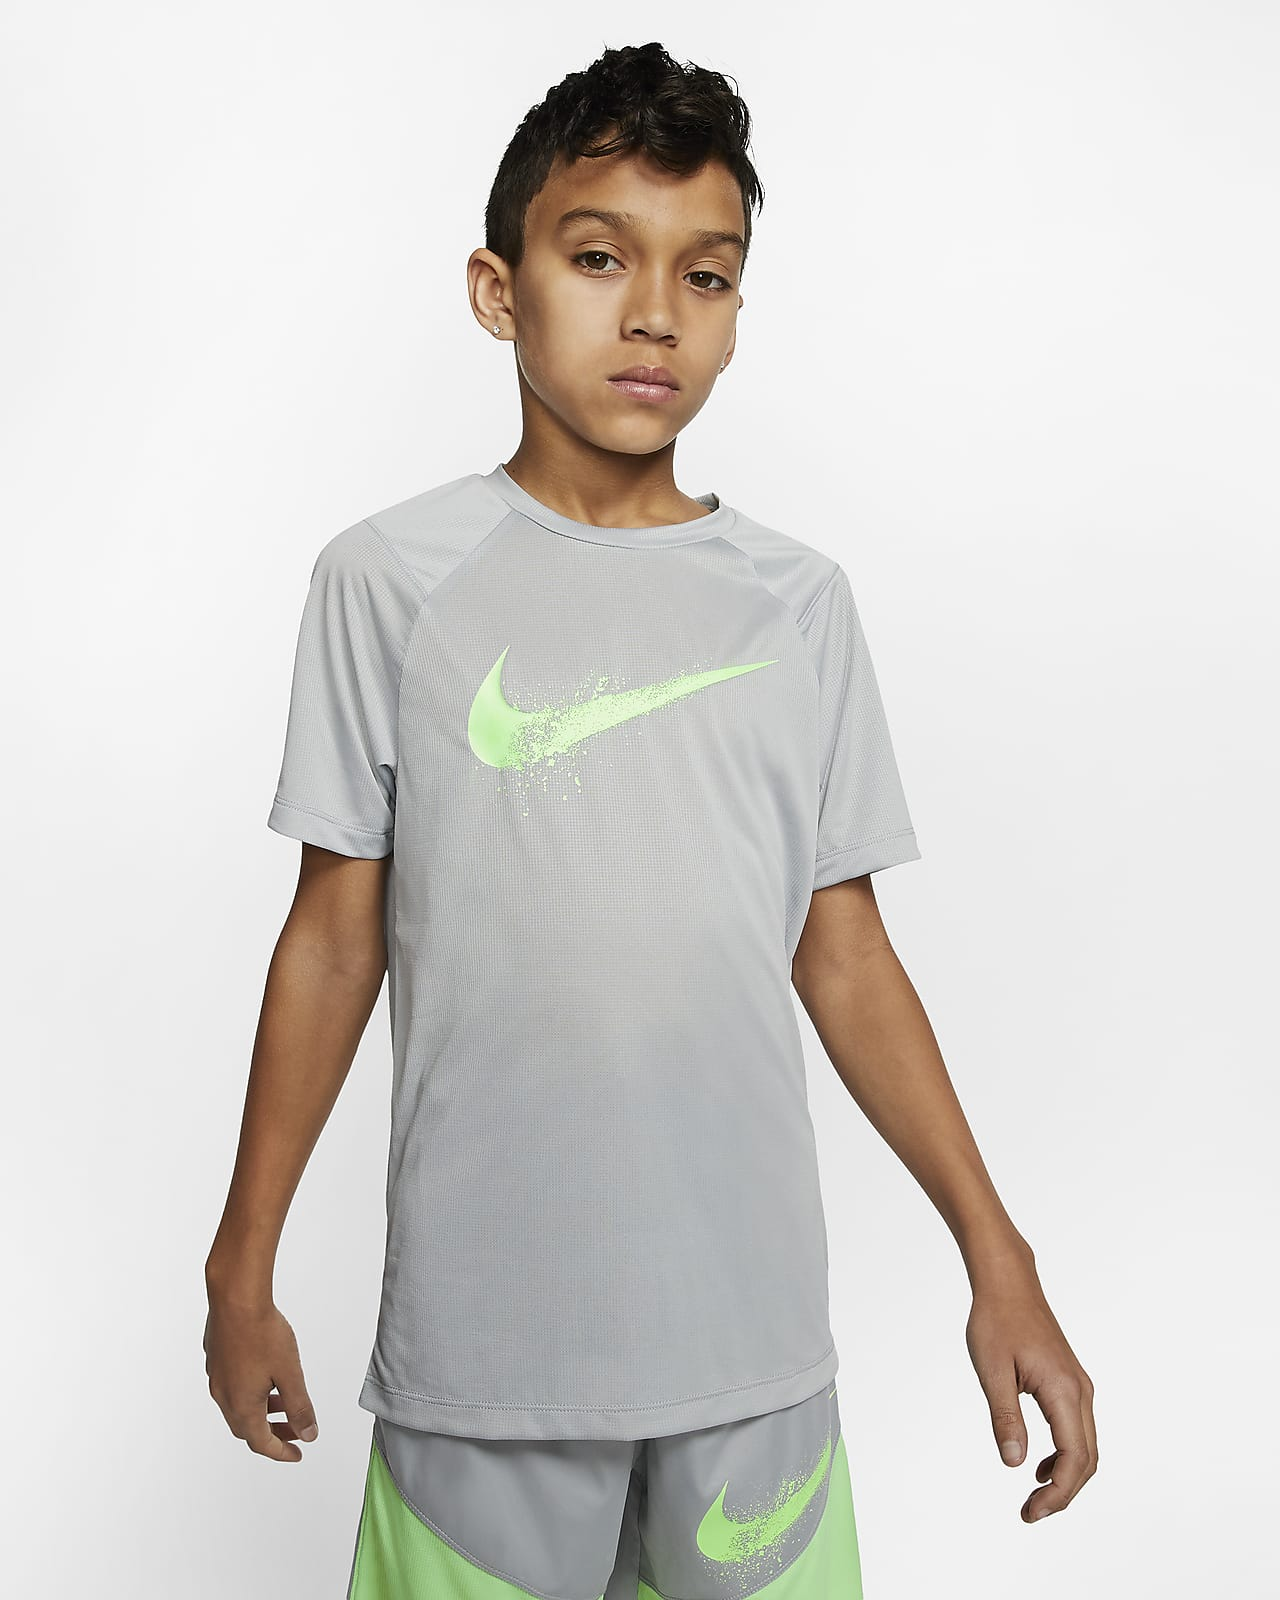 Nike Big Kids' (Boys') Short-Sleeve Graphic Training Top